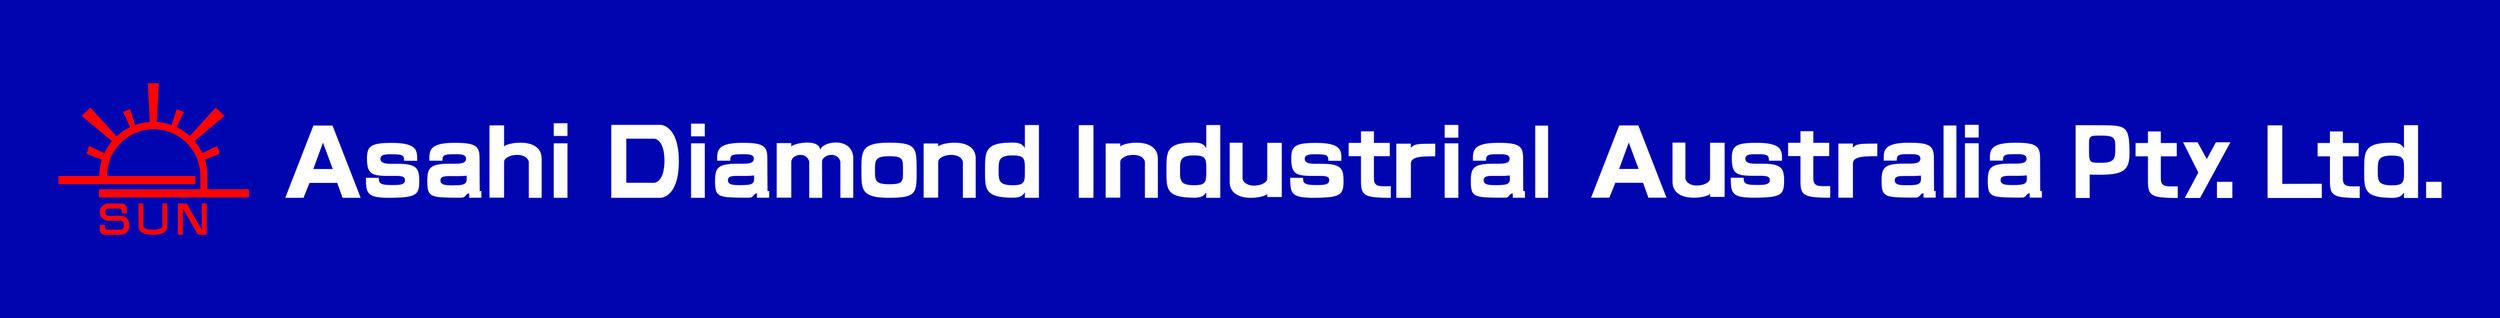 Asahi Diamond Industrial Australia Pty Ltd - Blue Background.jpg